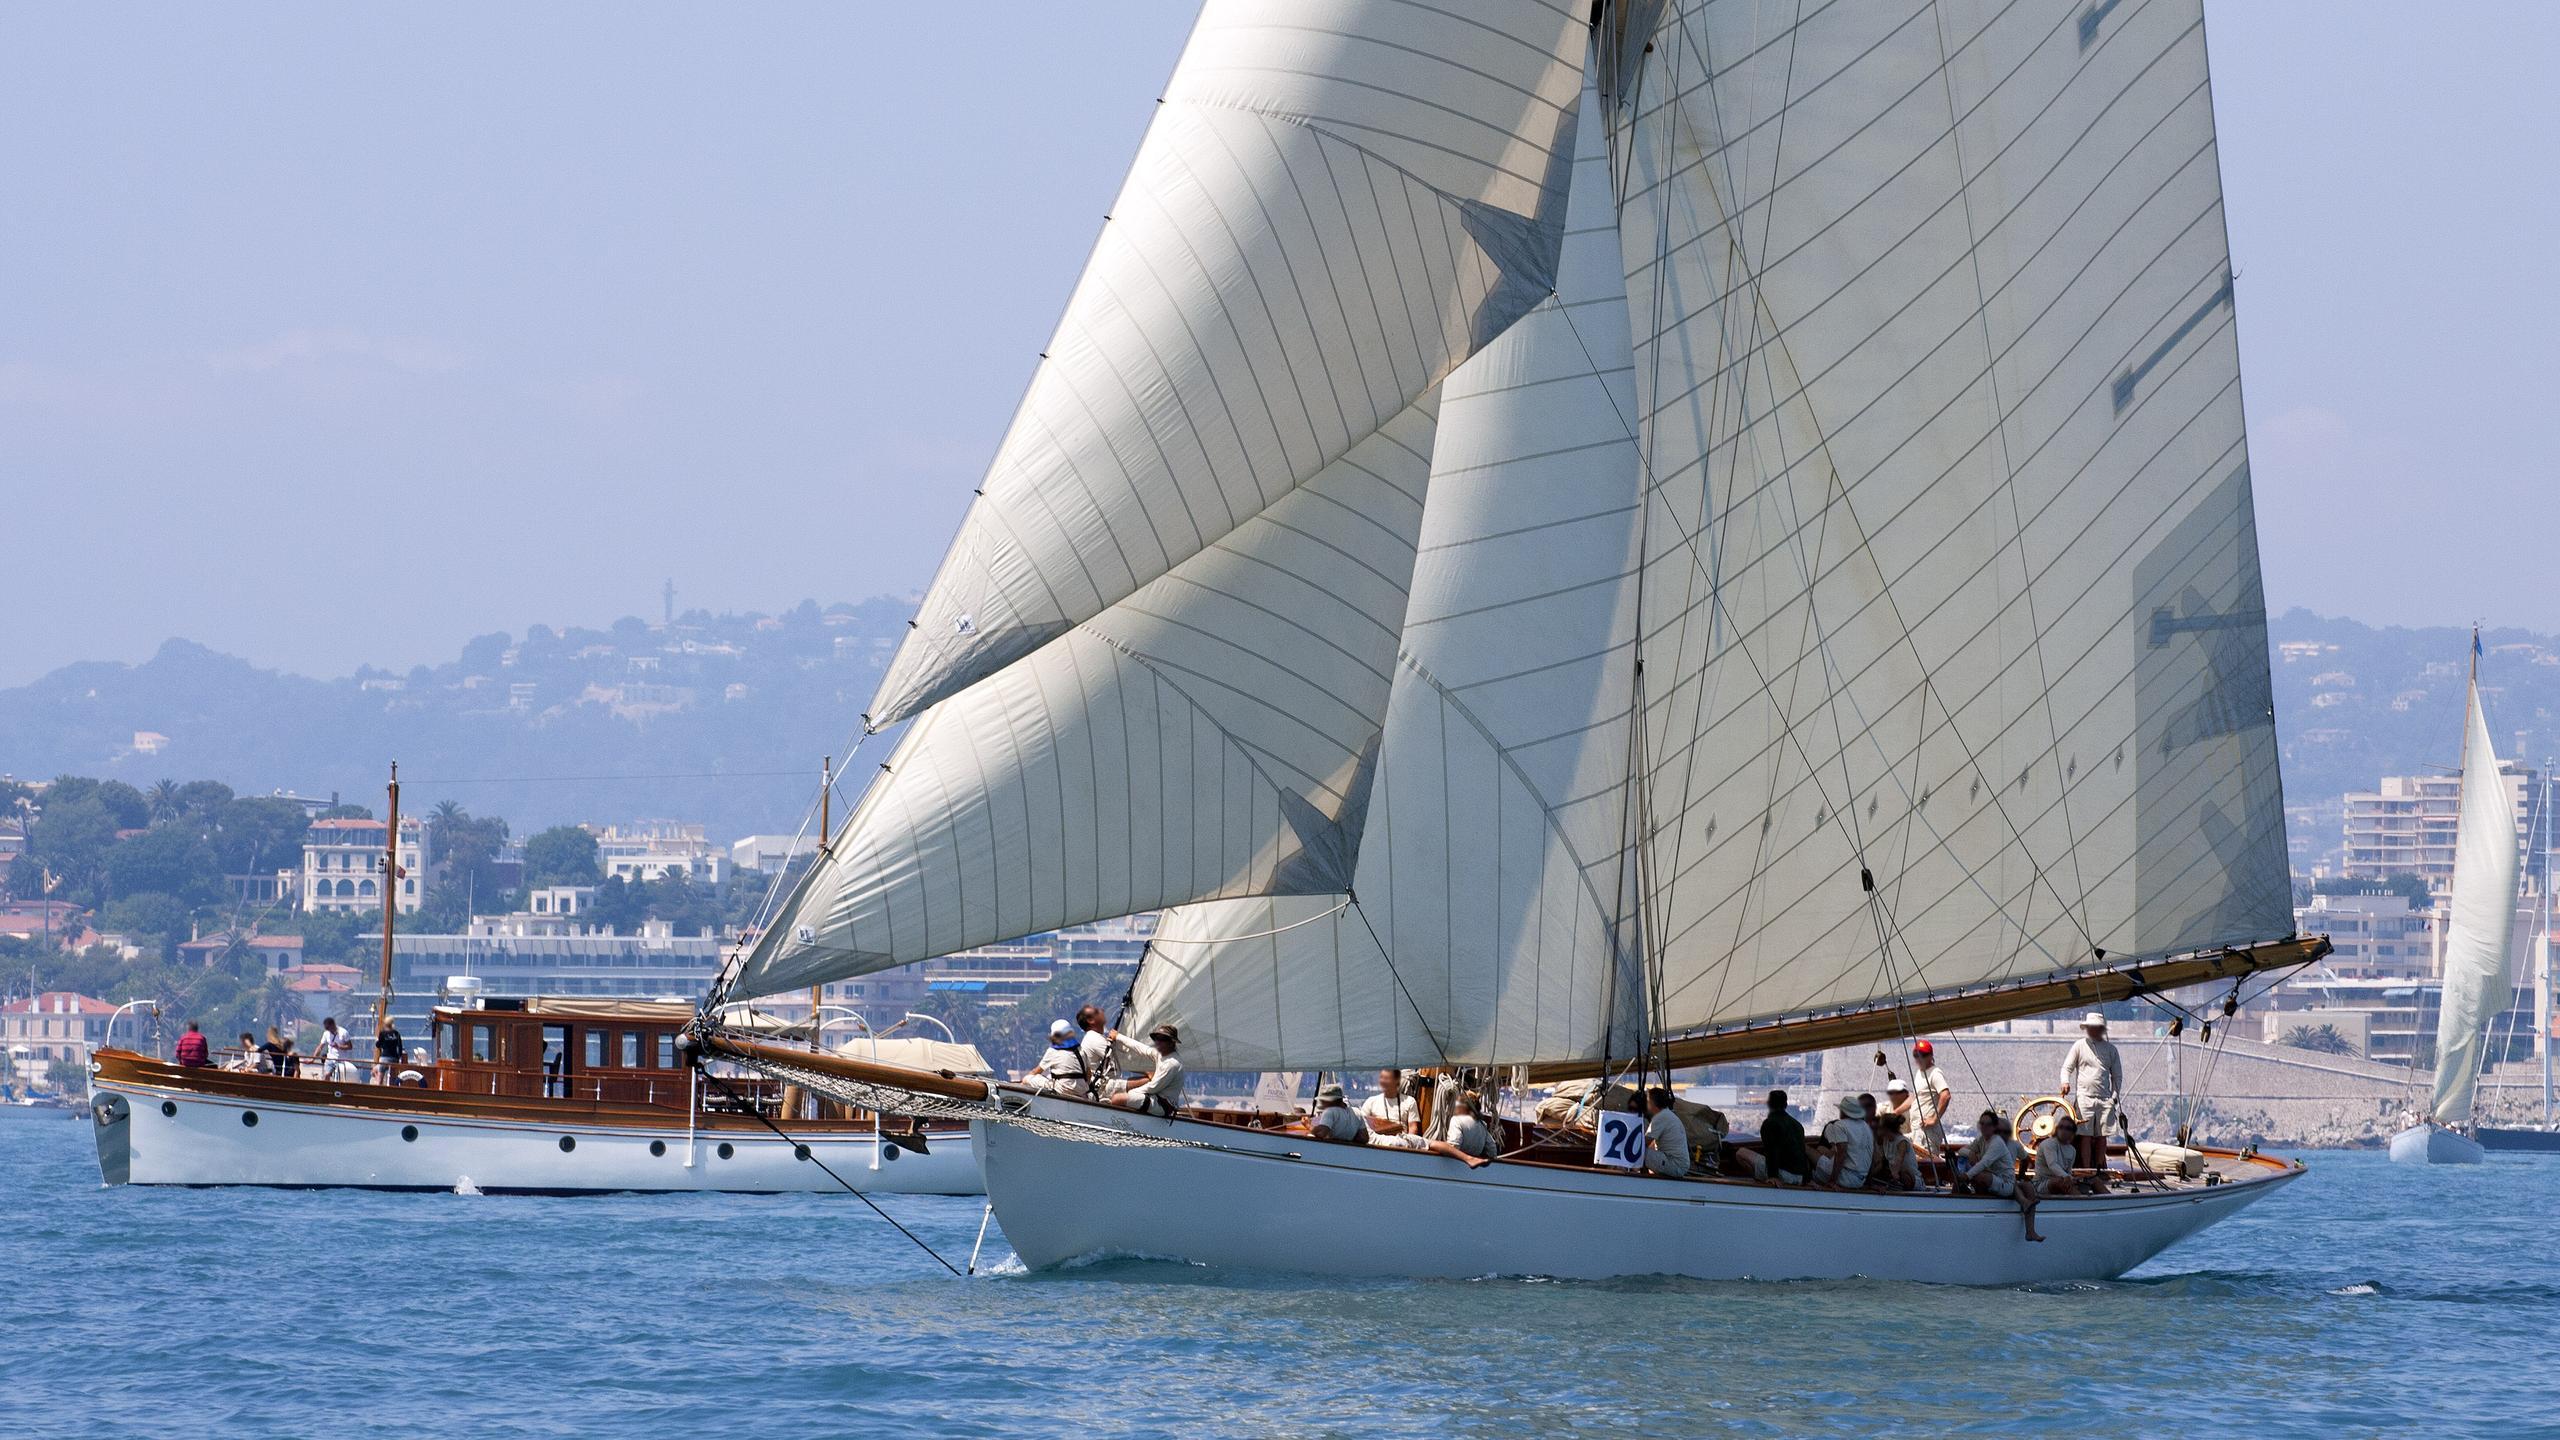 moonbeam-iii-sailing-yacht-fife-1903-32m-half-profile